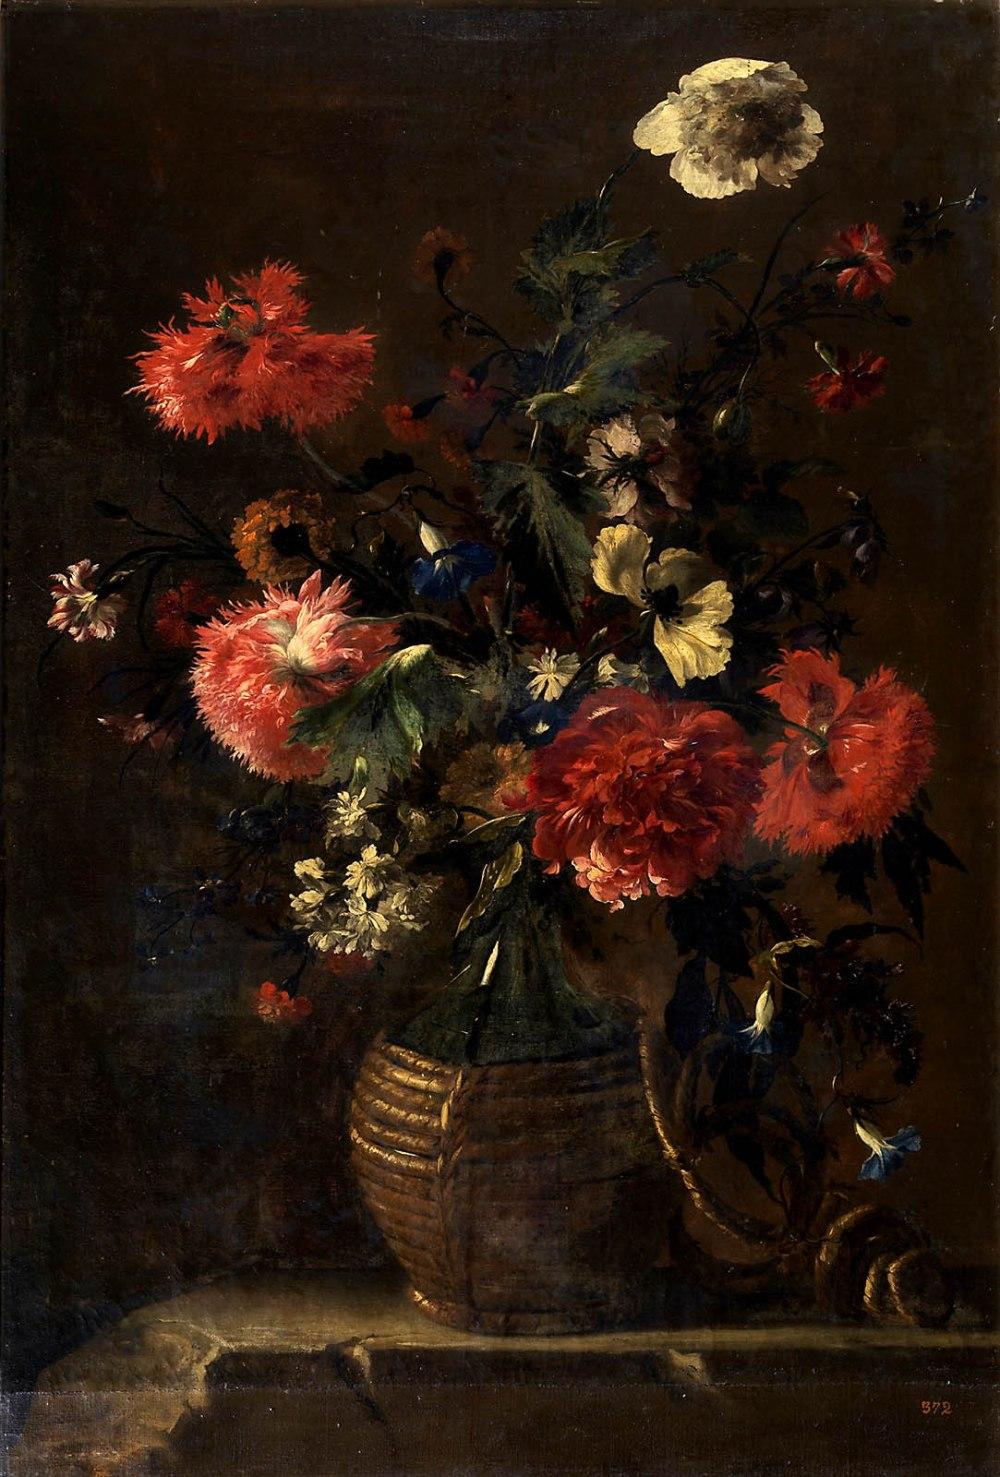 Bartolomé Pérez de la Dehesa (atribuido a). Florero. Siglo XVII. Museo Nacional del Prado. Madrid.